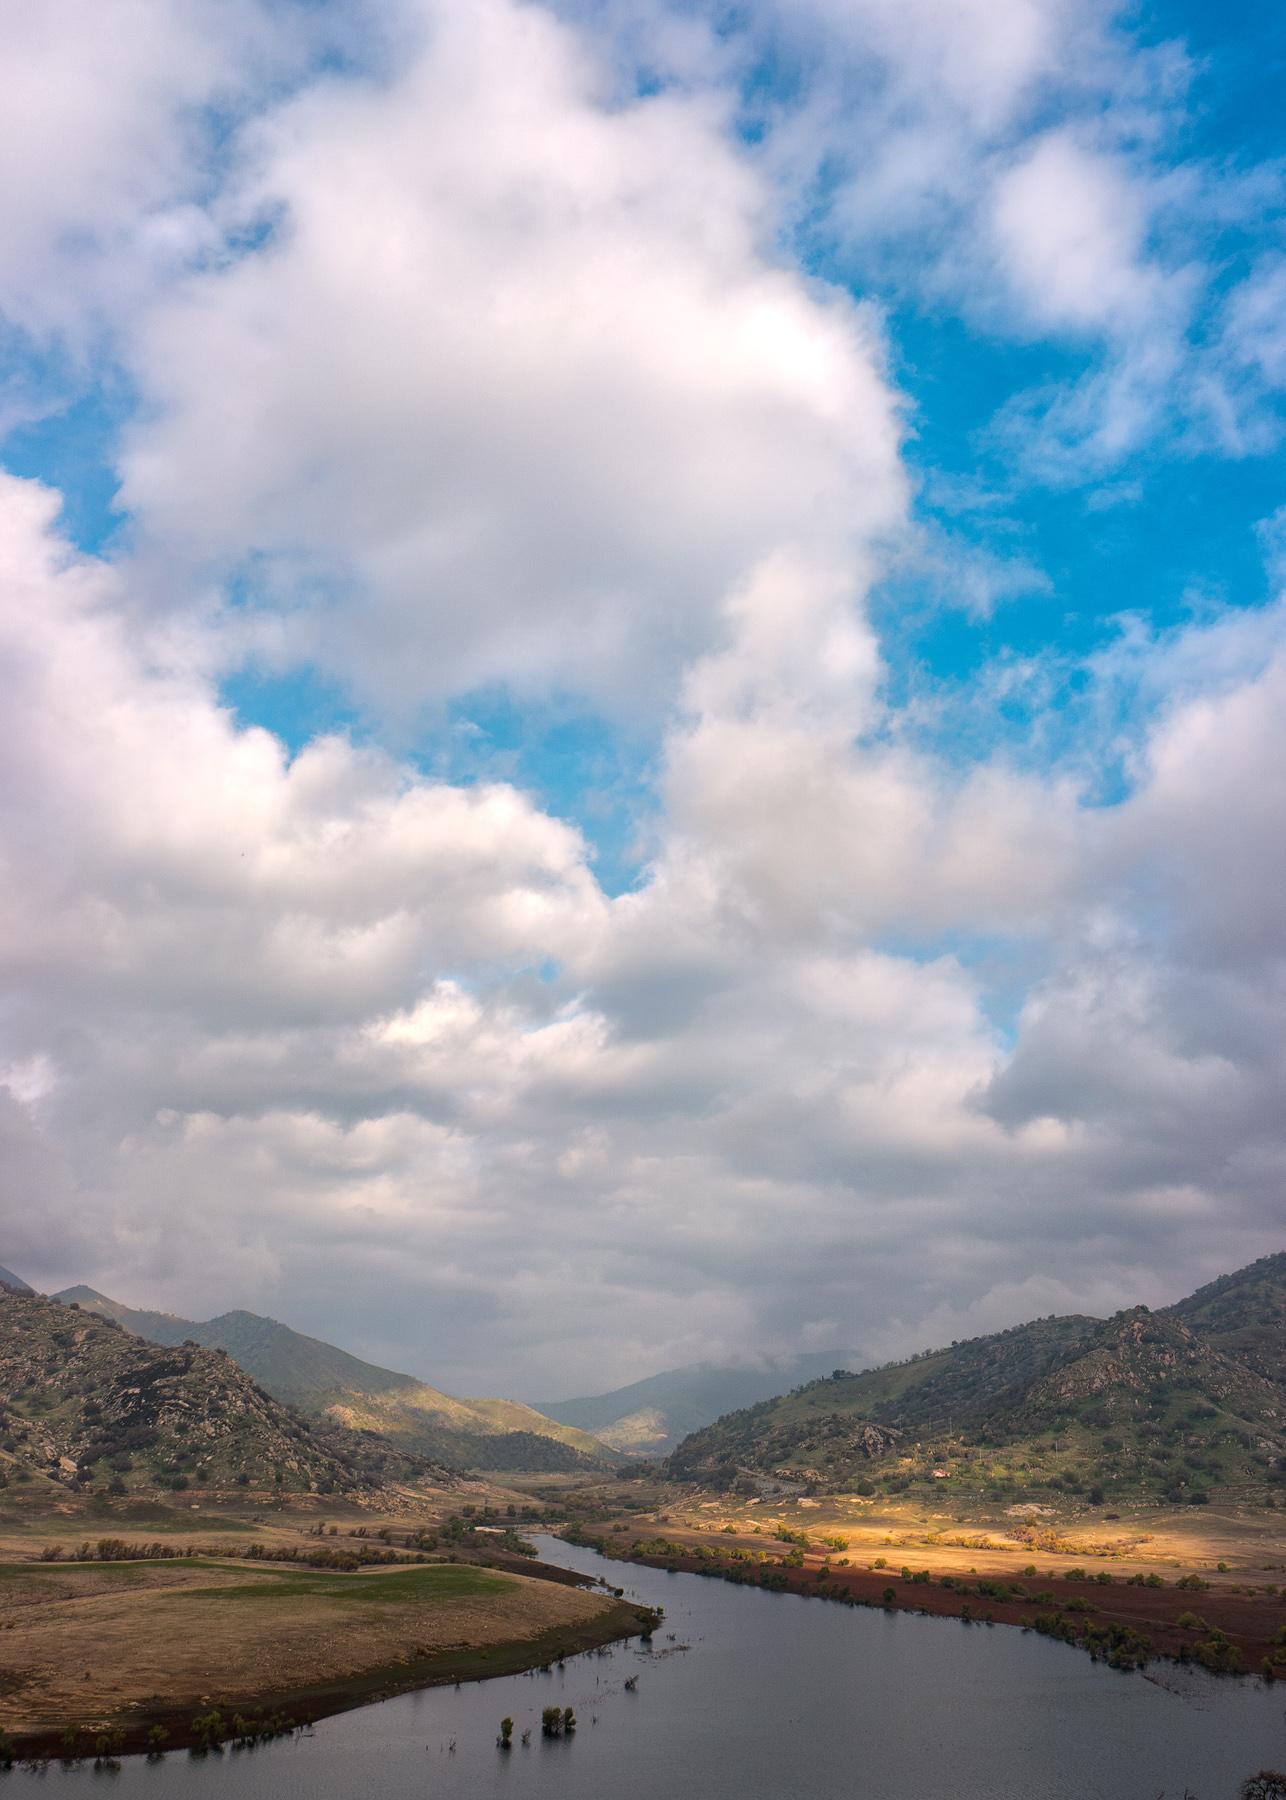 Wasim Muklashy Photography_Sequoia National Park_California_December 2015_-SAM_4797-Edit.jpg